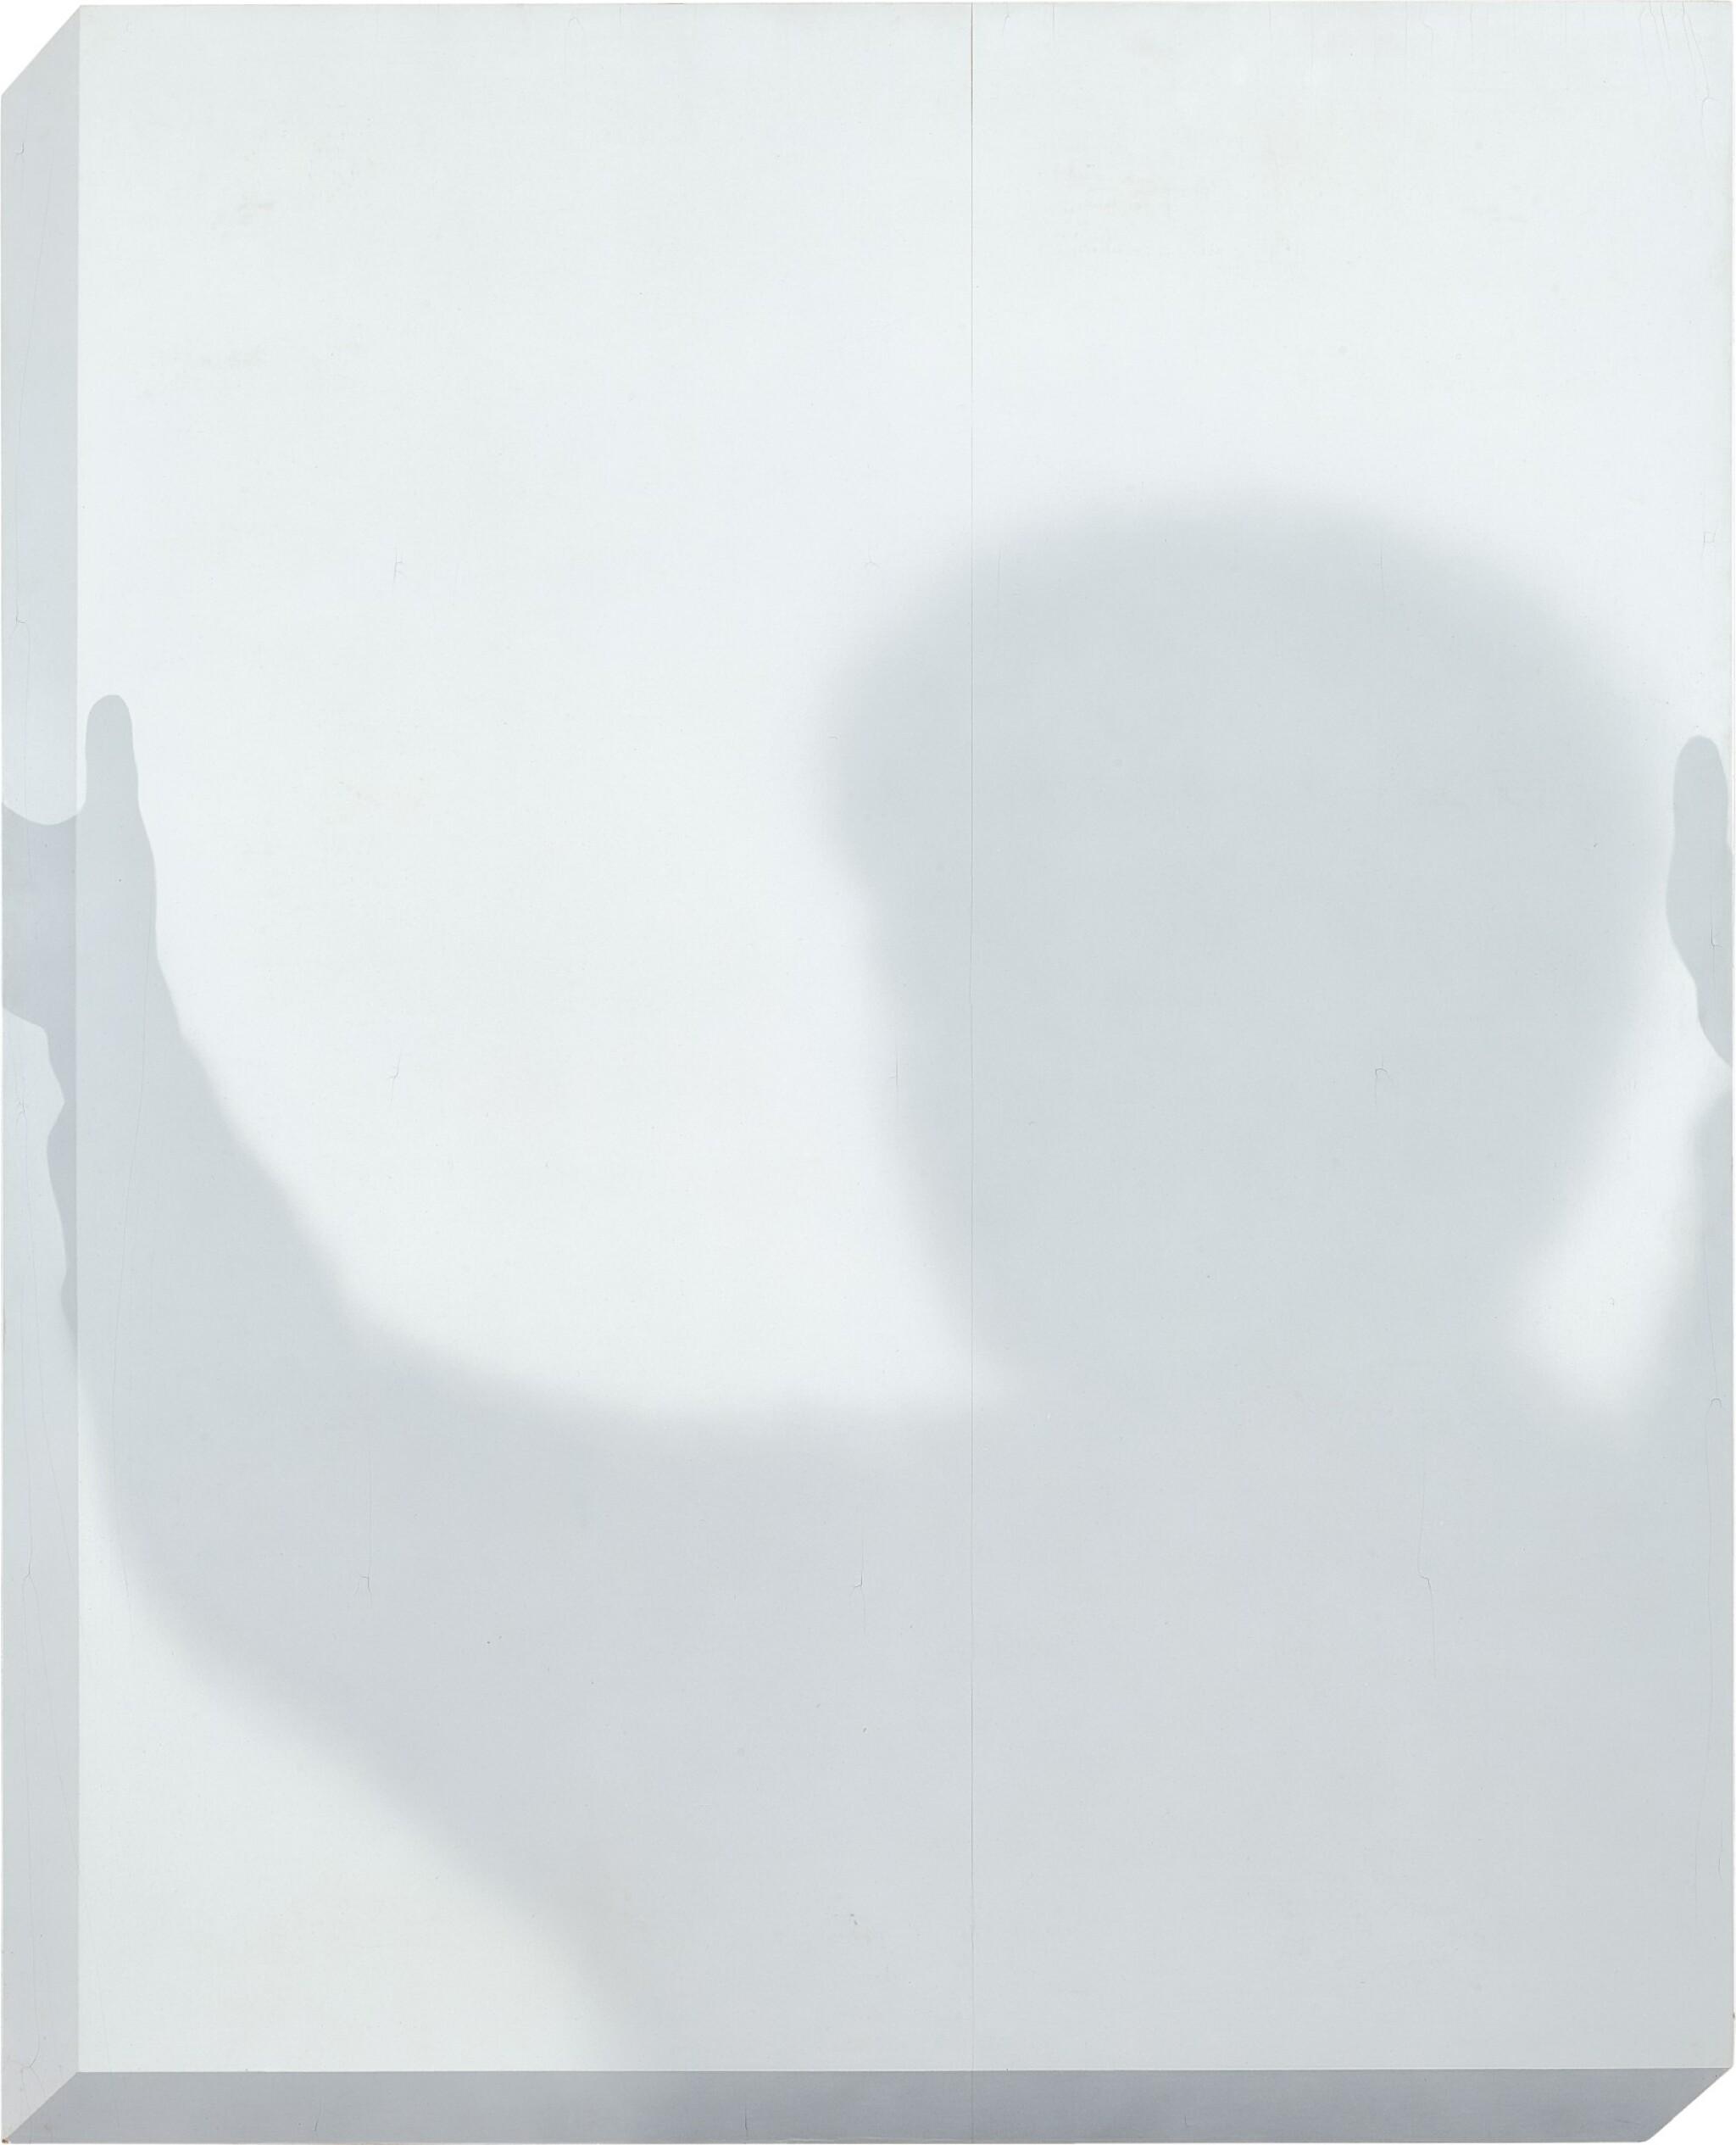 View full screen - View 1 of Lot 531. Jiro Takamatsu 高松次郎 | Shadow of Myself 我的影子.